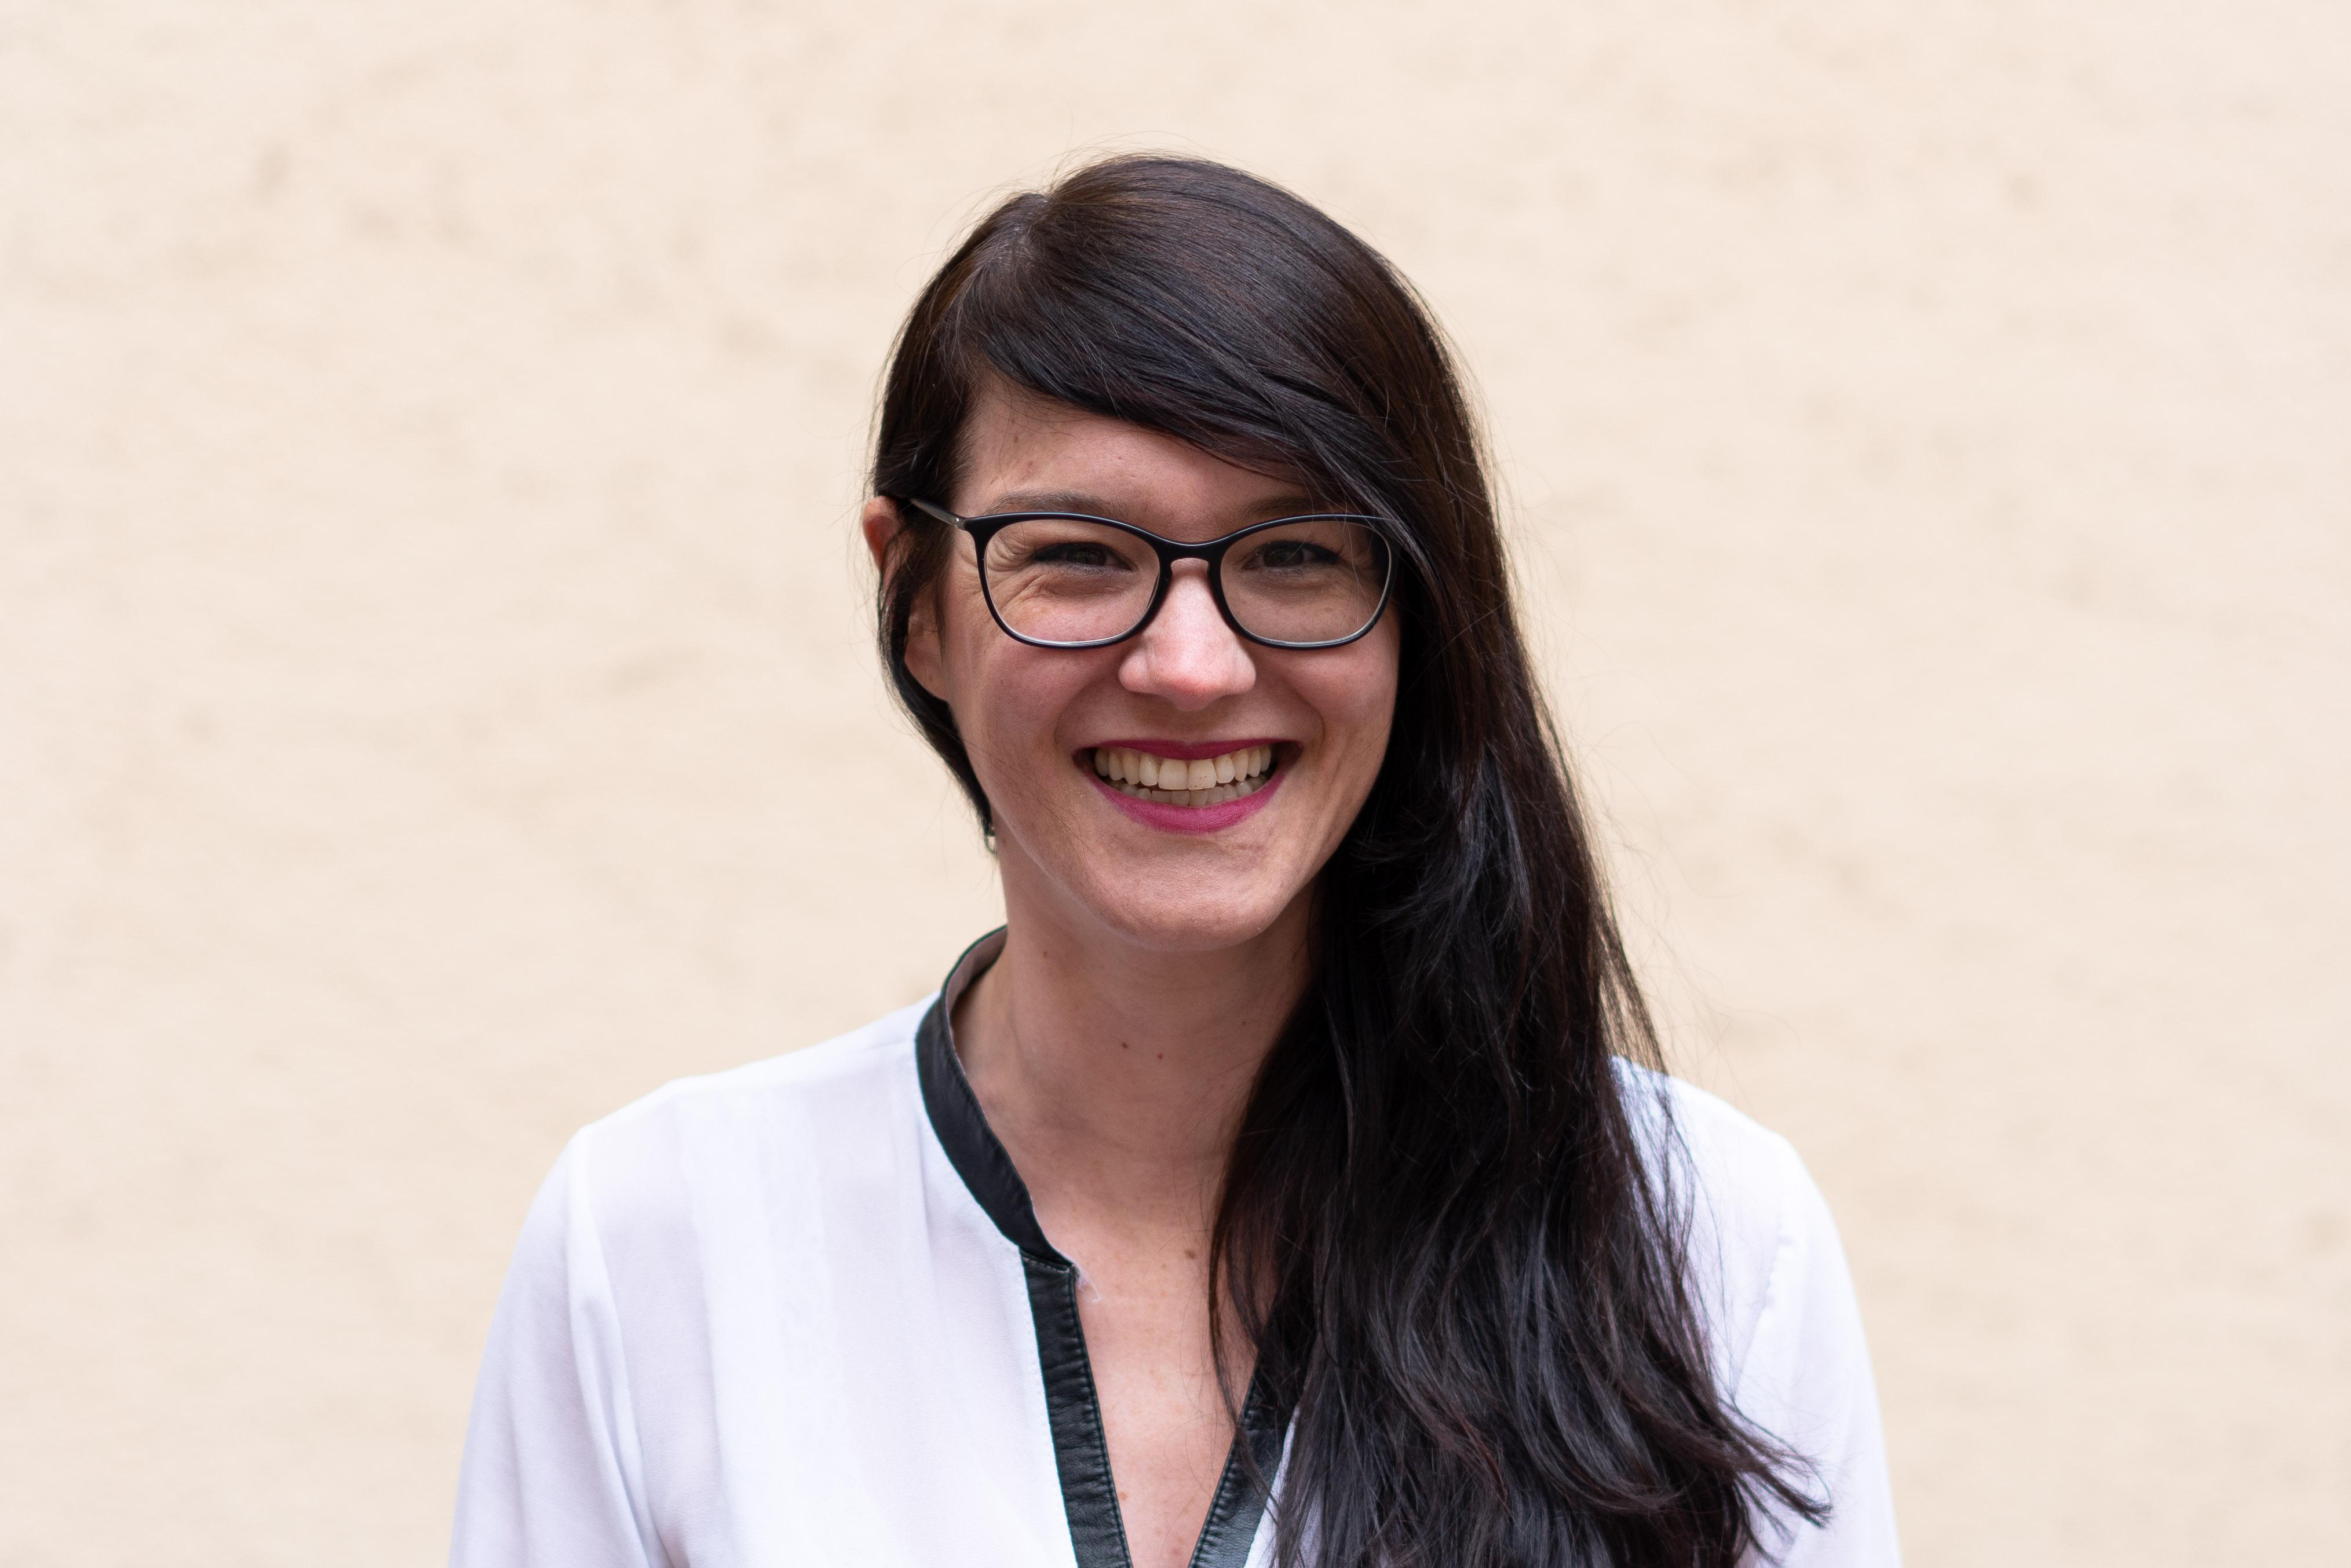 Christina Rammler